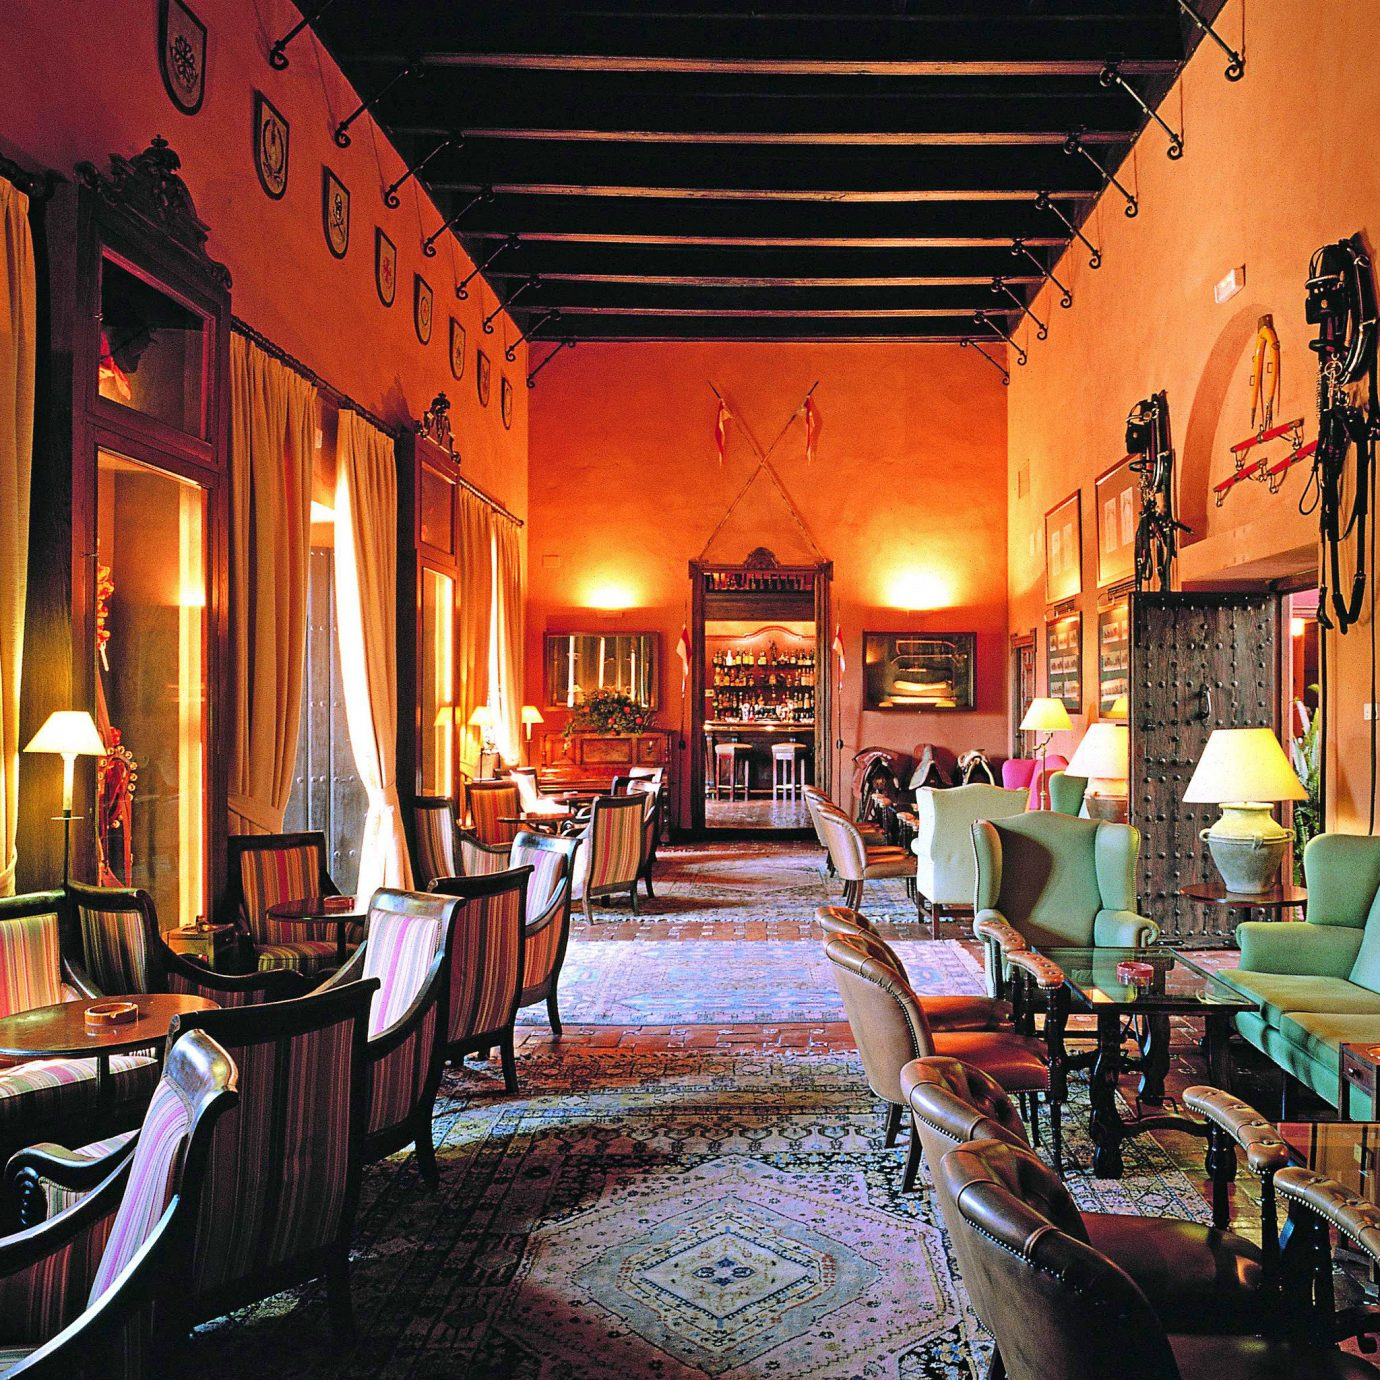 Lobby Lounge Romantic Rustic building restaurant home Resort Bar